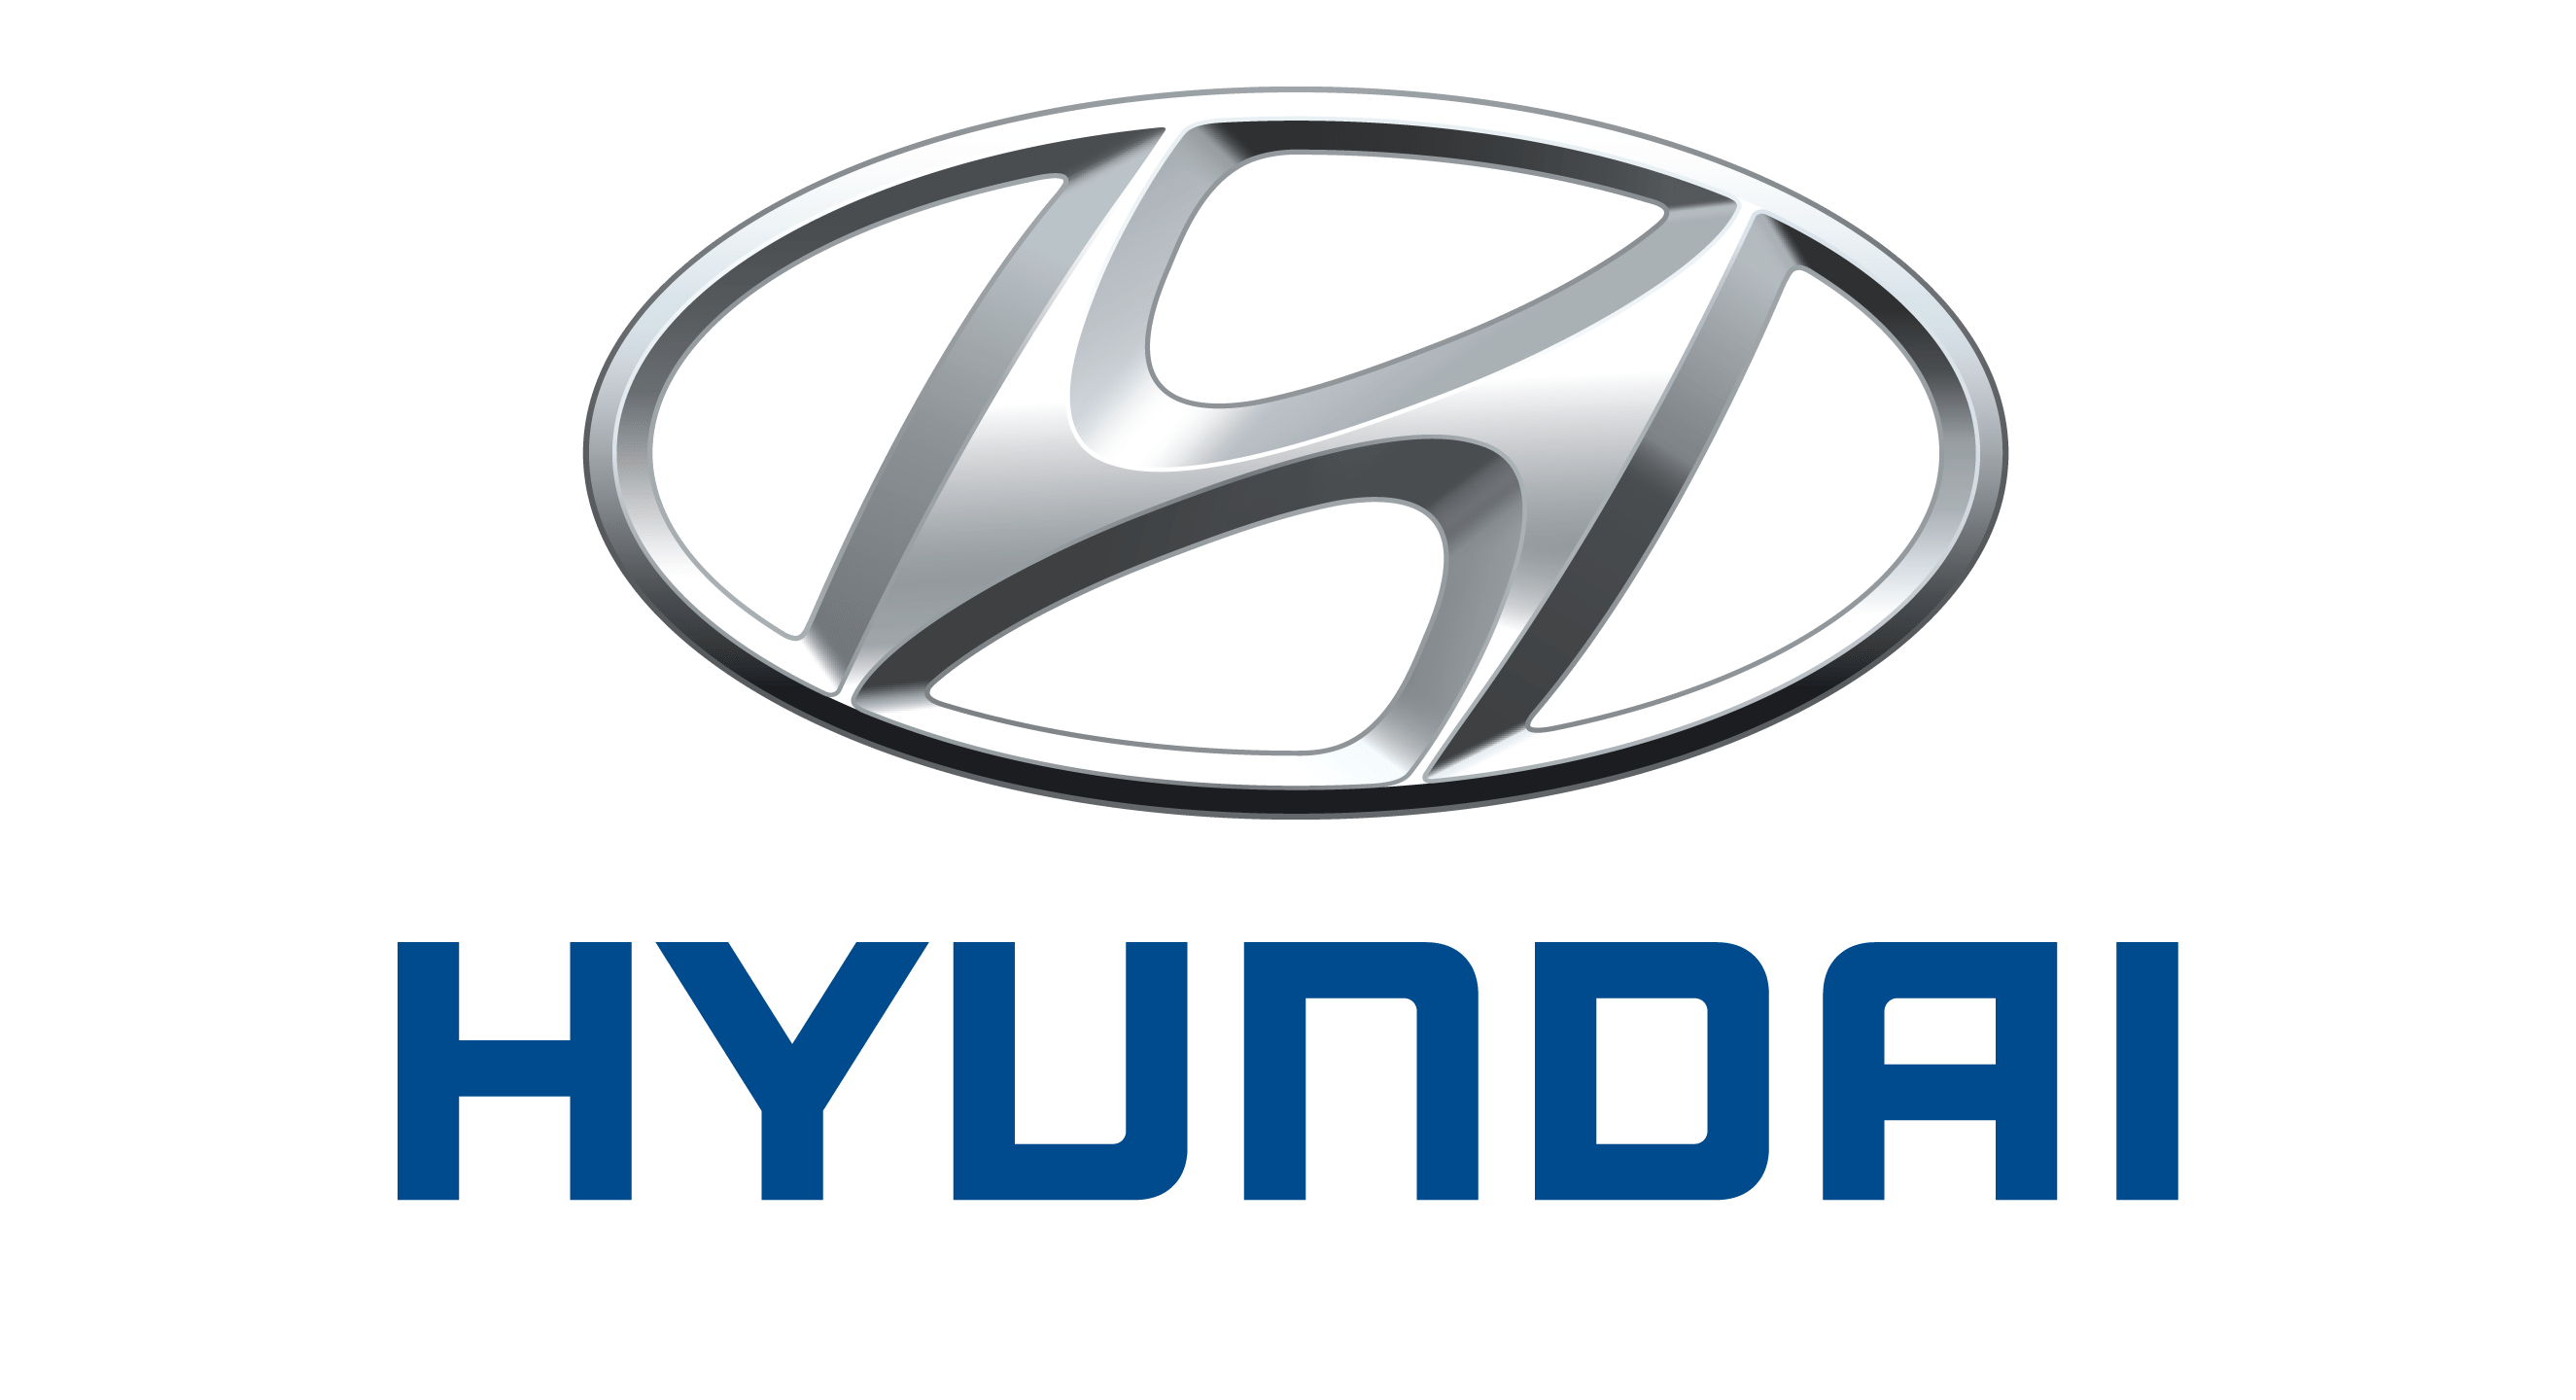 Car Logo Hyundai - Car, Transparent background PNG HD thumbnail